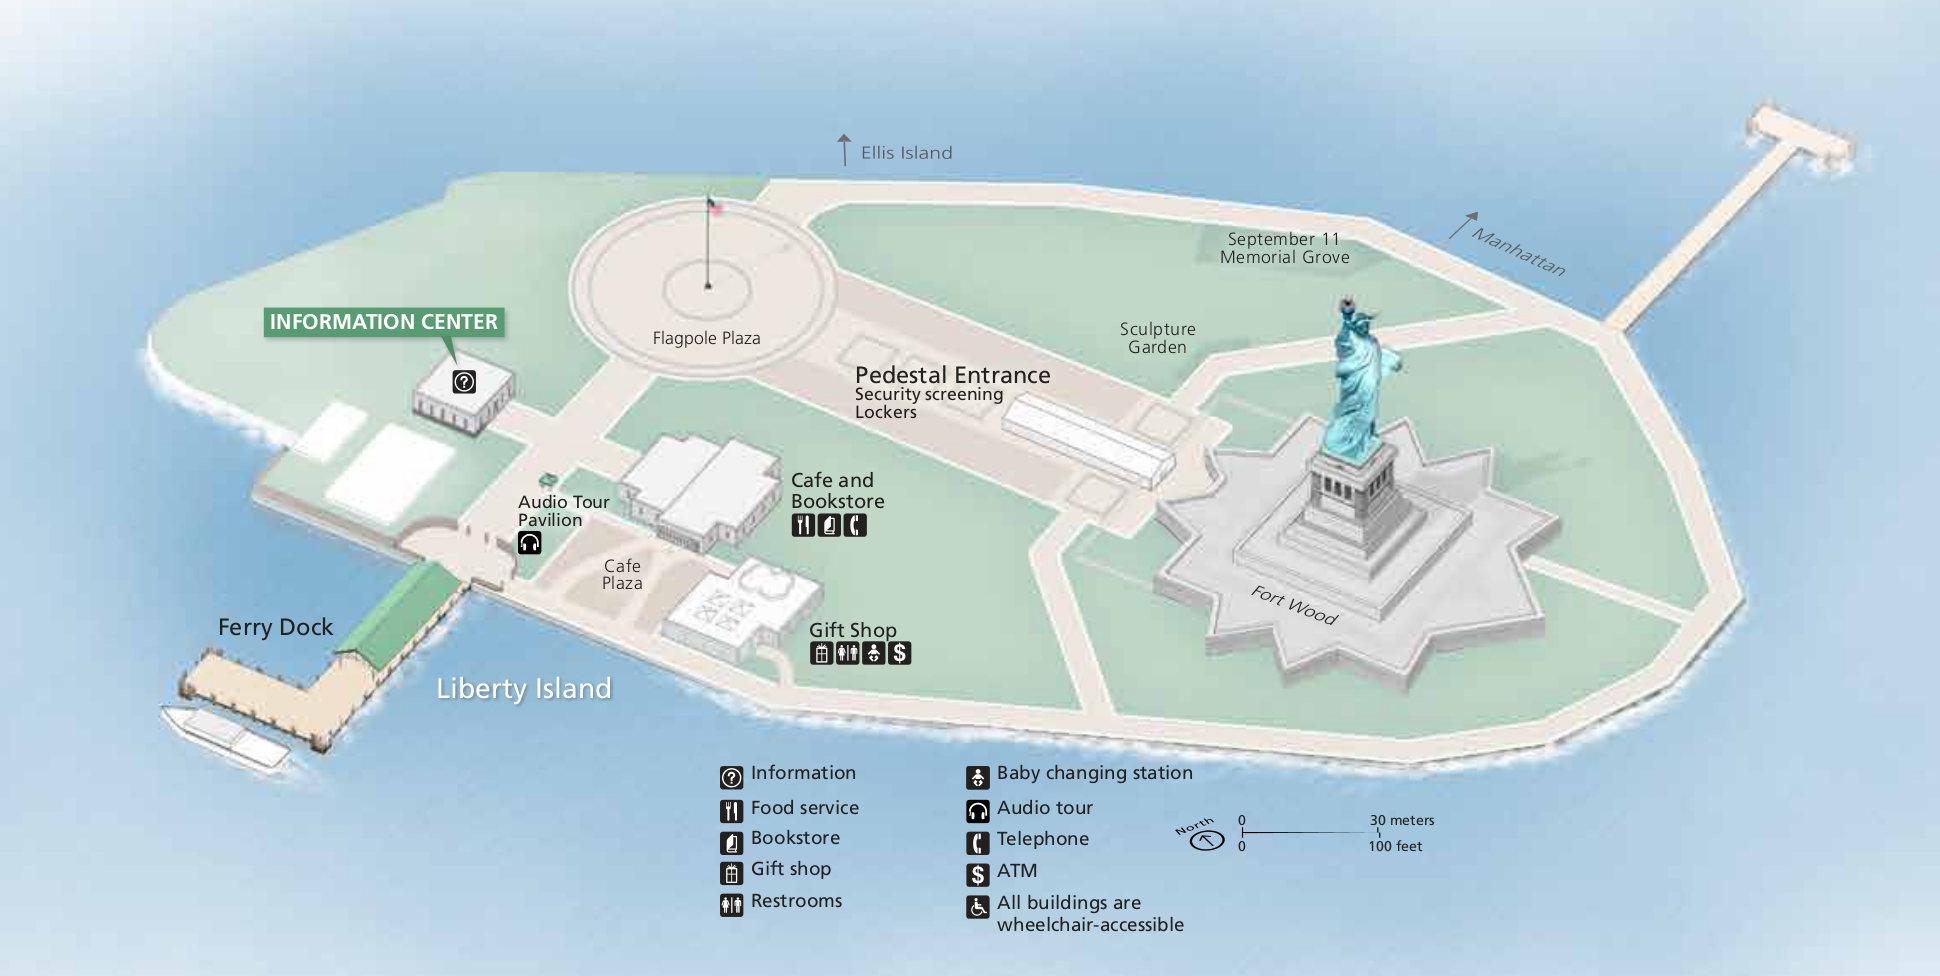 Ellis Island Caracteristics